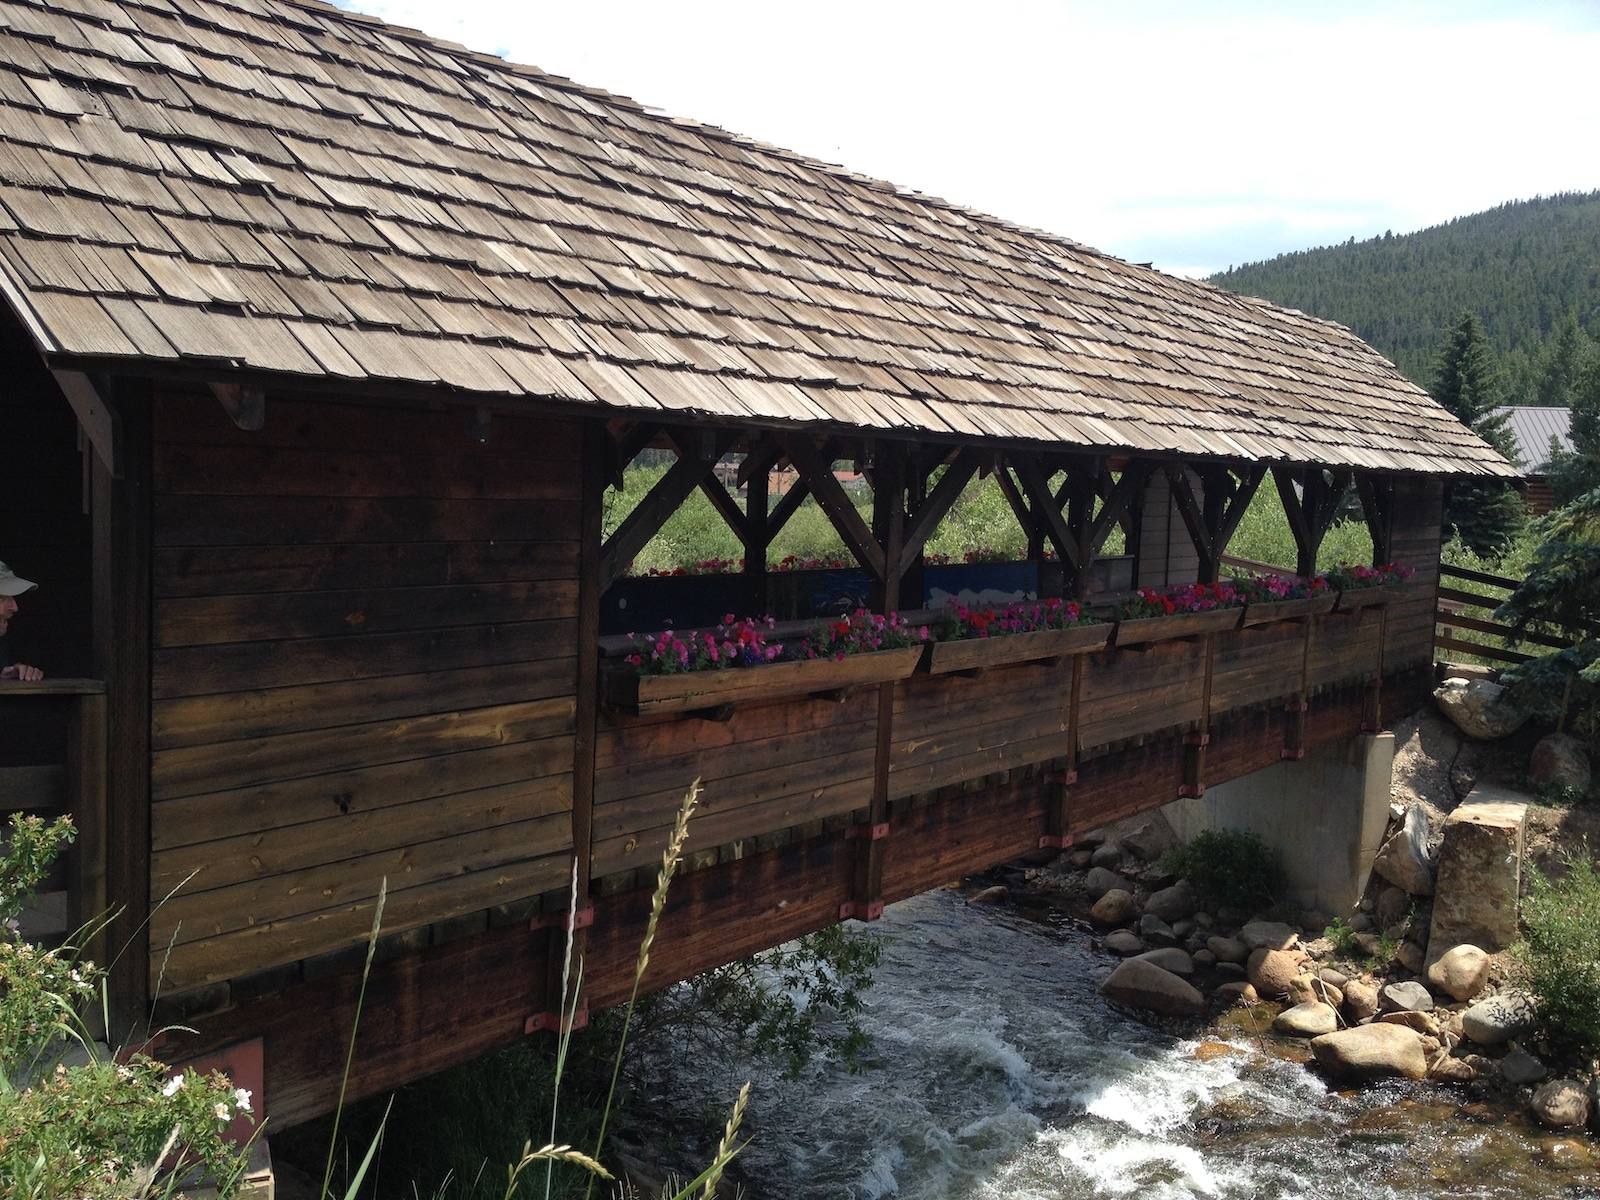 Nederland CO Covered Wood Bridge